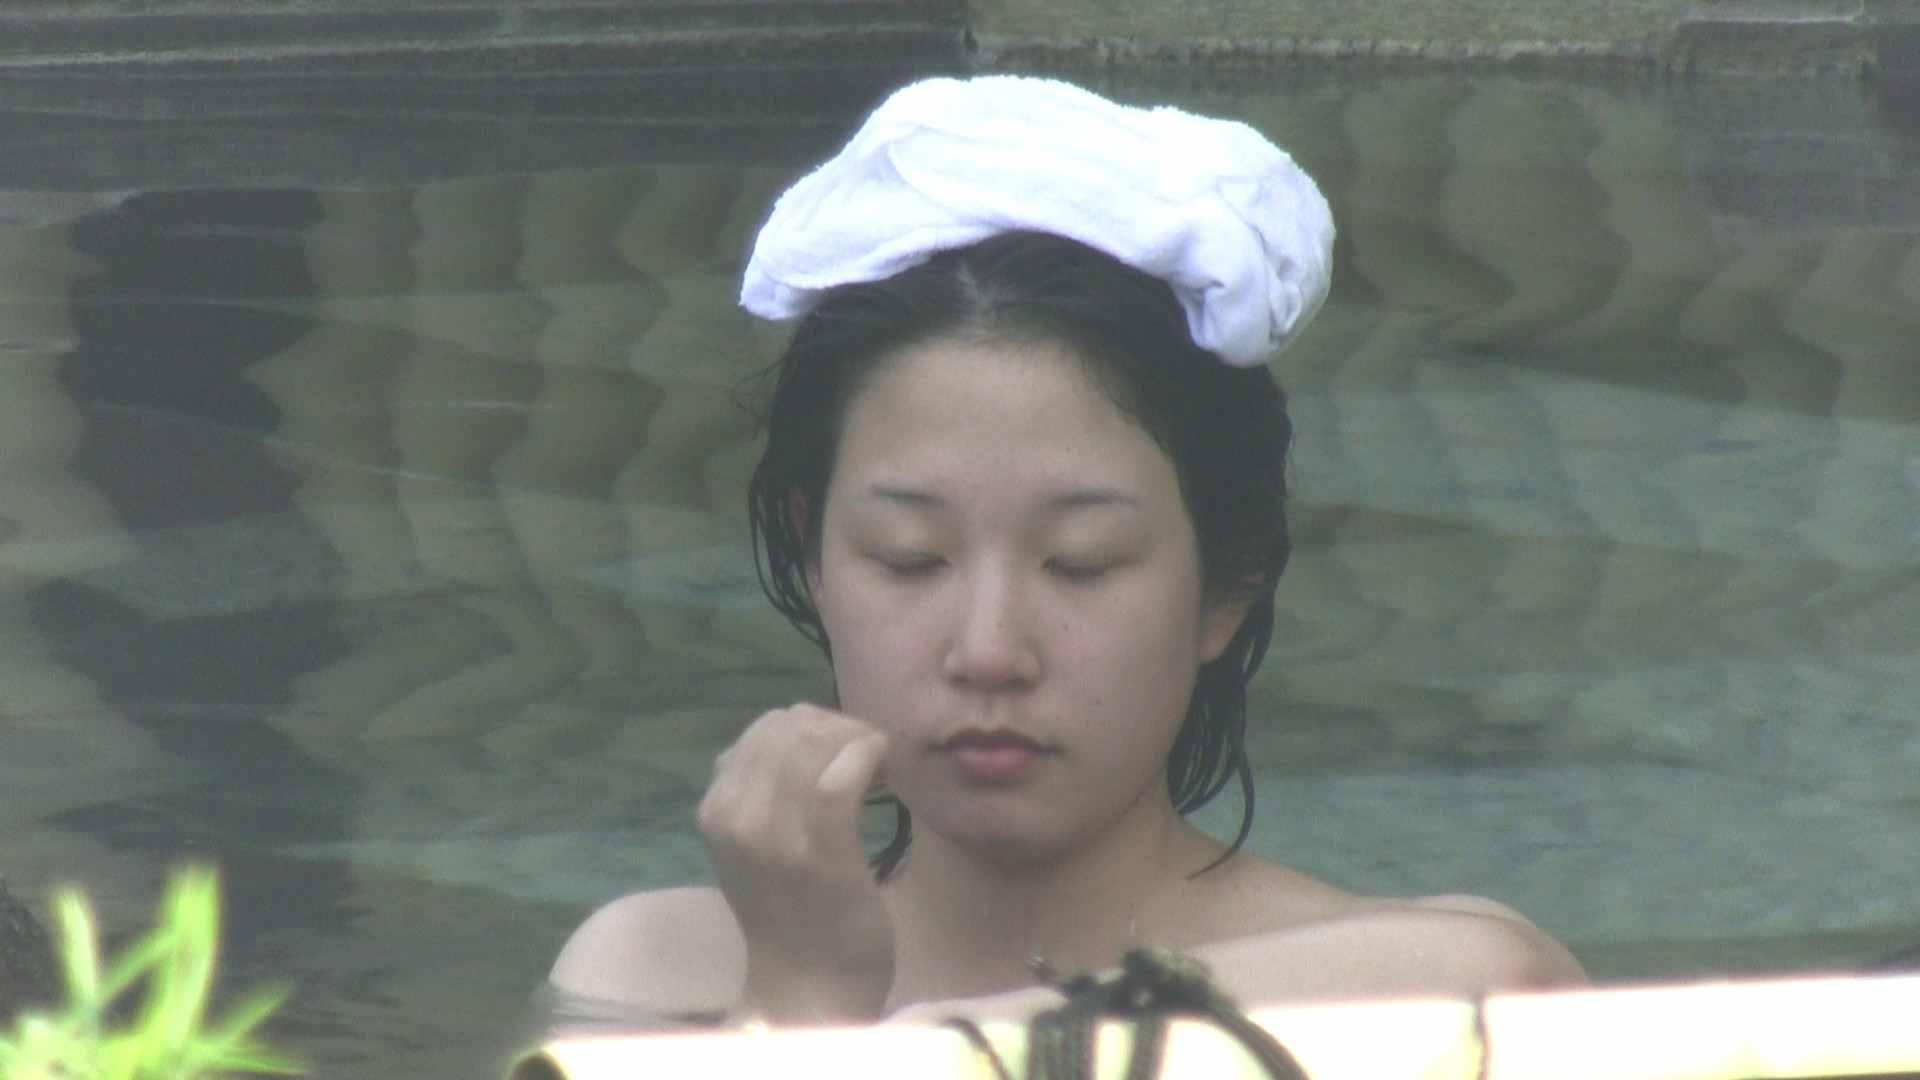 Aquaな露天風呂Vol.172 盗撮映像  113Pix 59